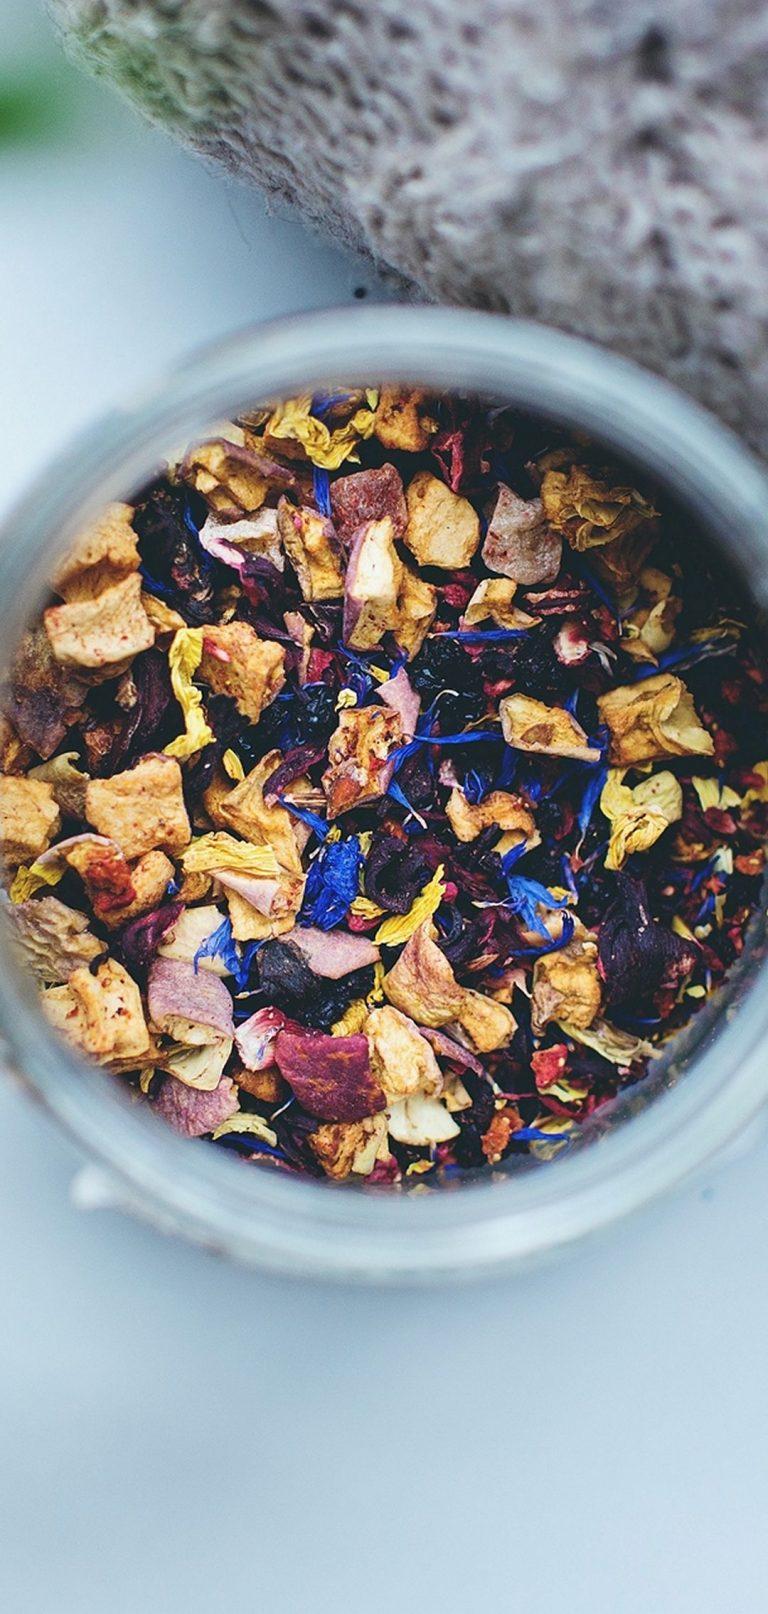 Tea Flowers Bank 1080x2270 768x1614